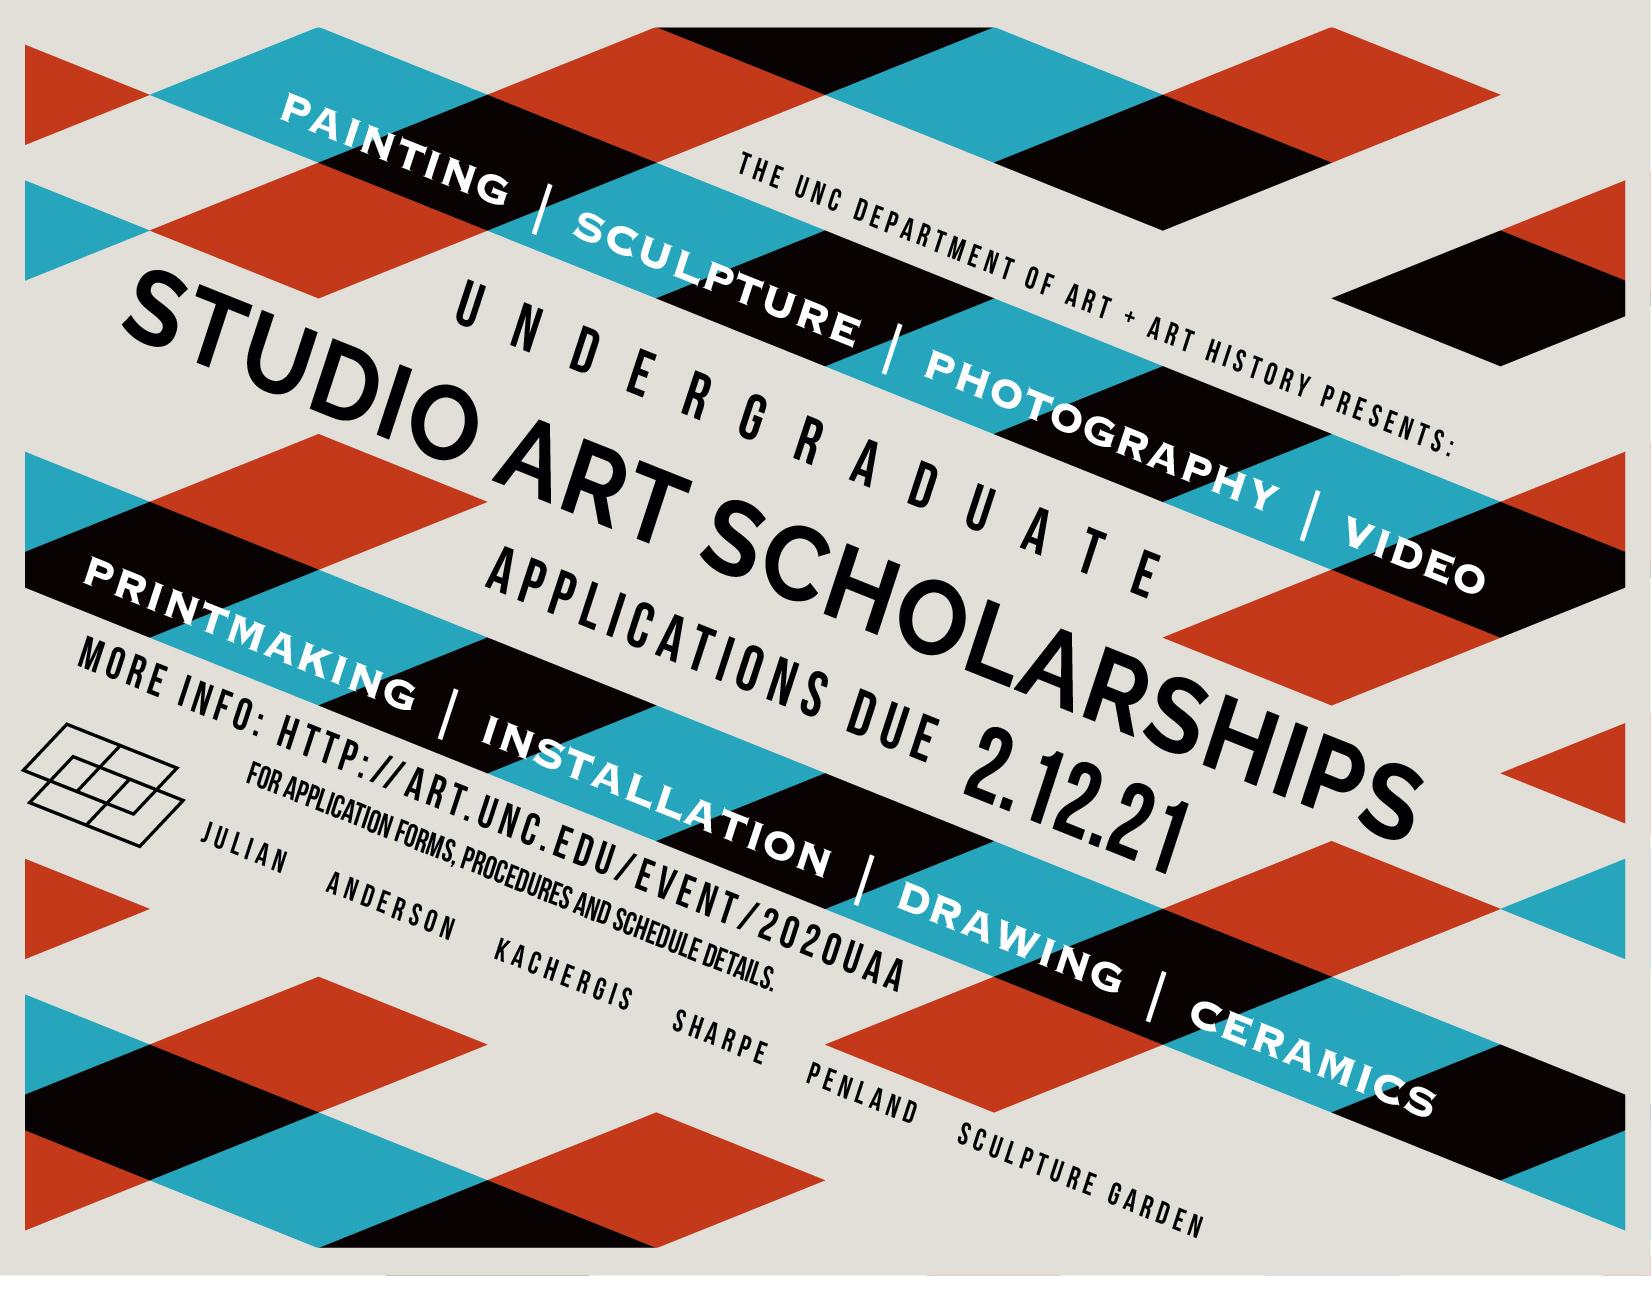 Undergraduate Studio Art Scholarships Applications due: 2-12-21